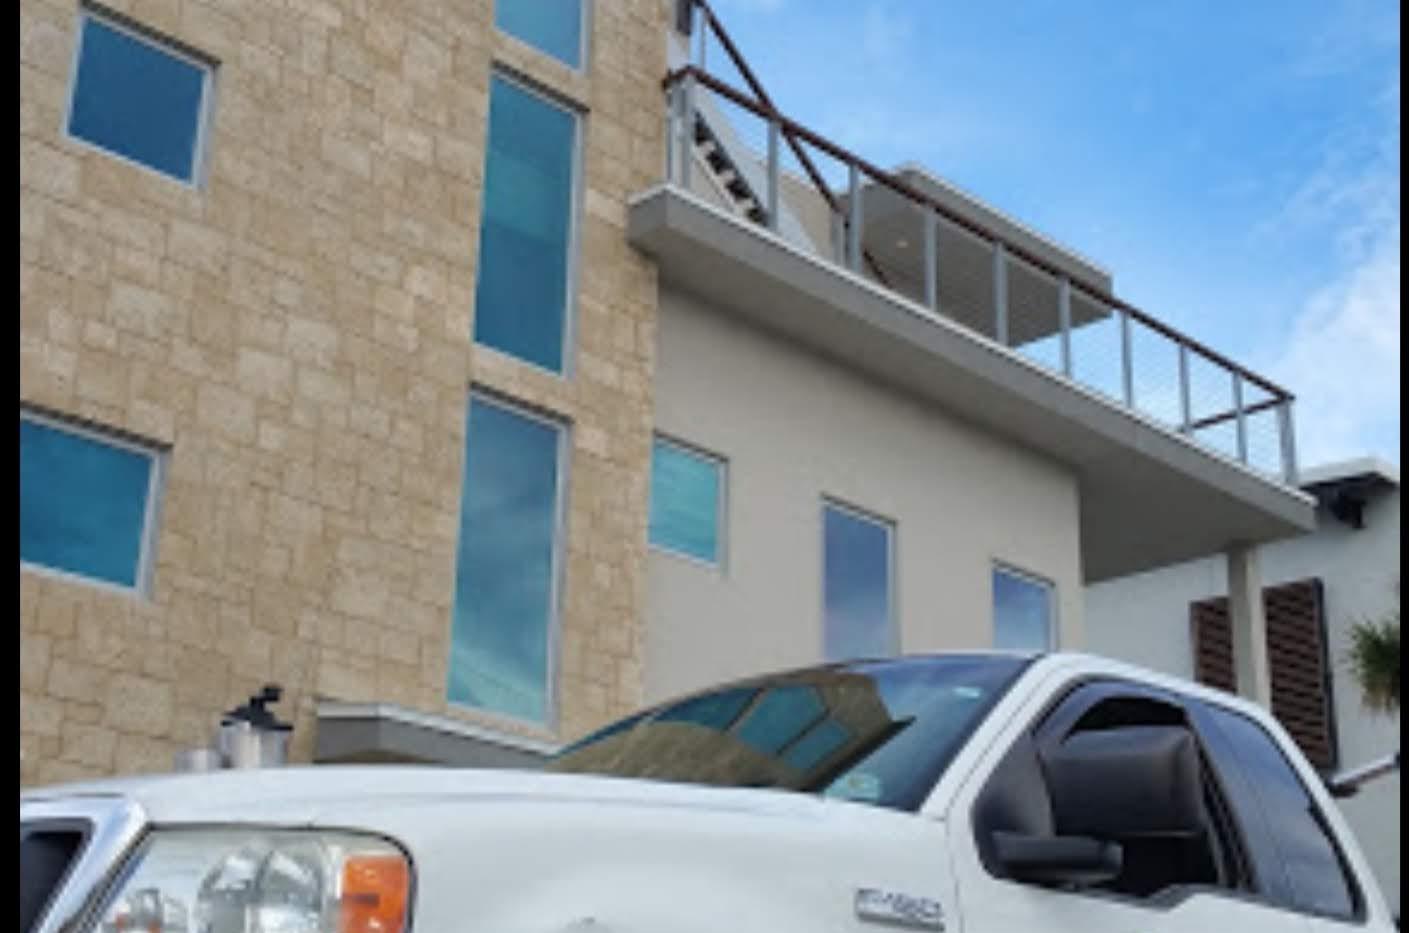 Residential window Cleaning, Fernandian Beach Florida